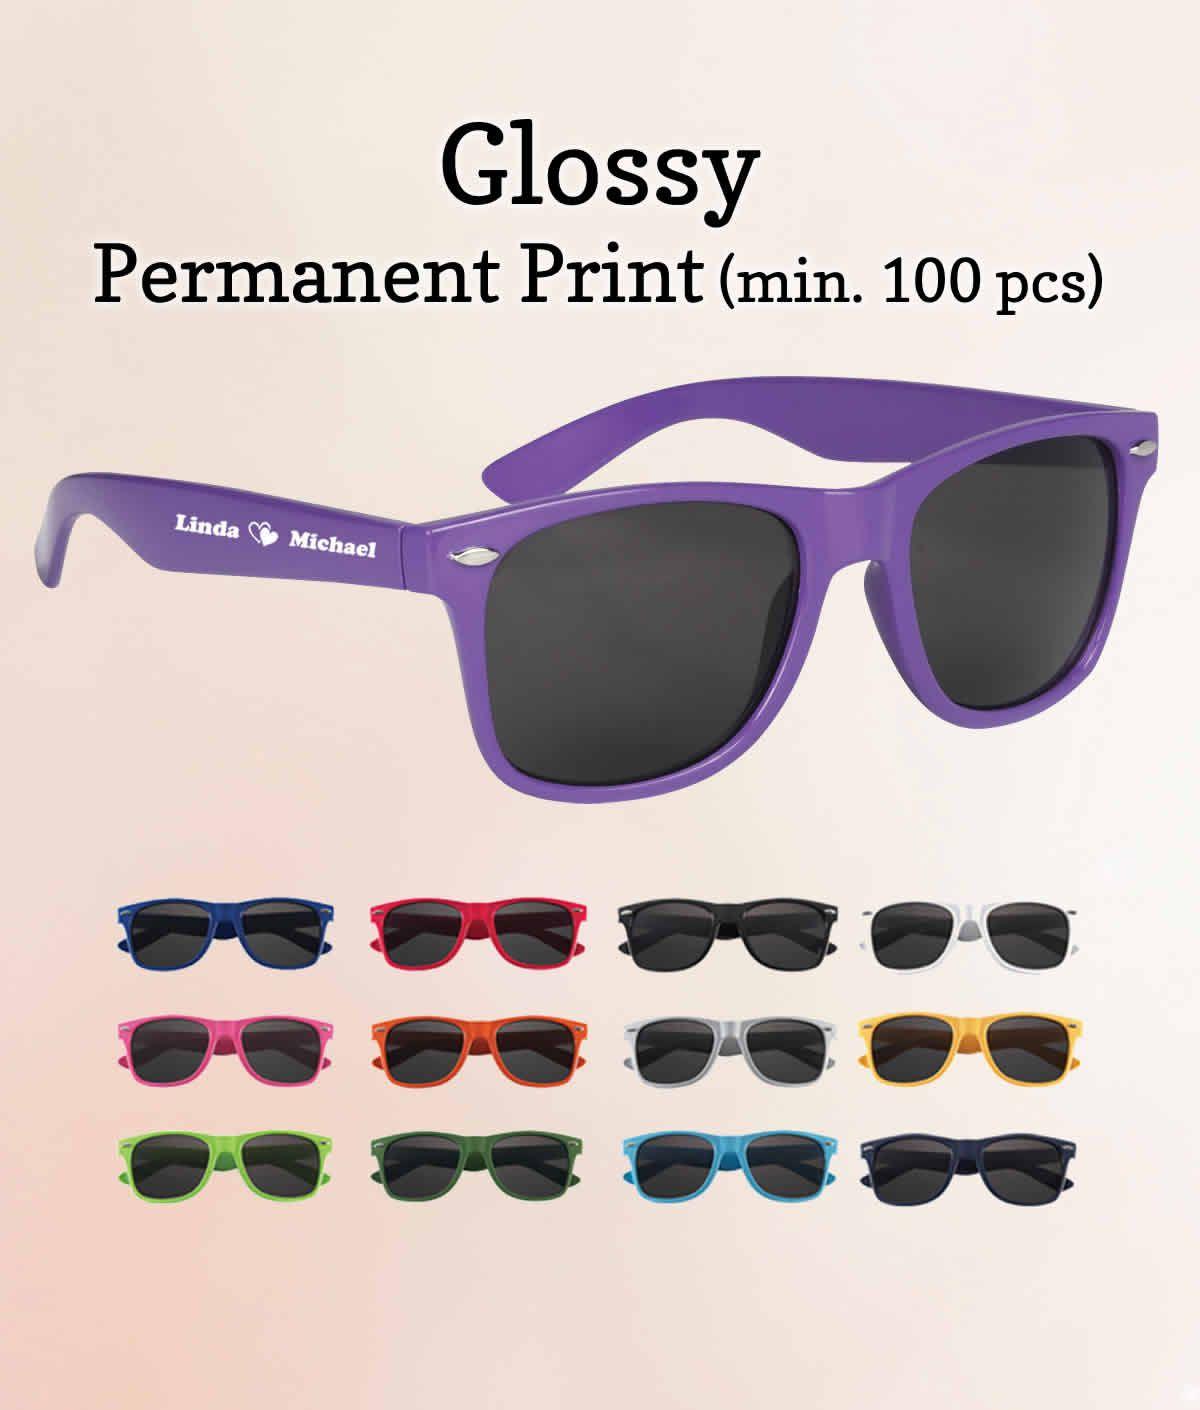 Personalized Wedding Sunglasses Glossy FREE Proofs